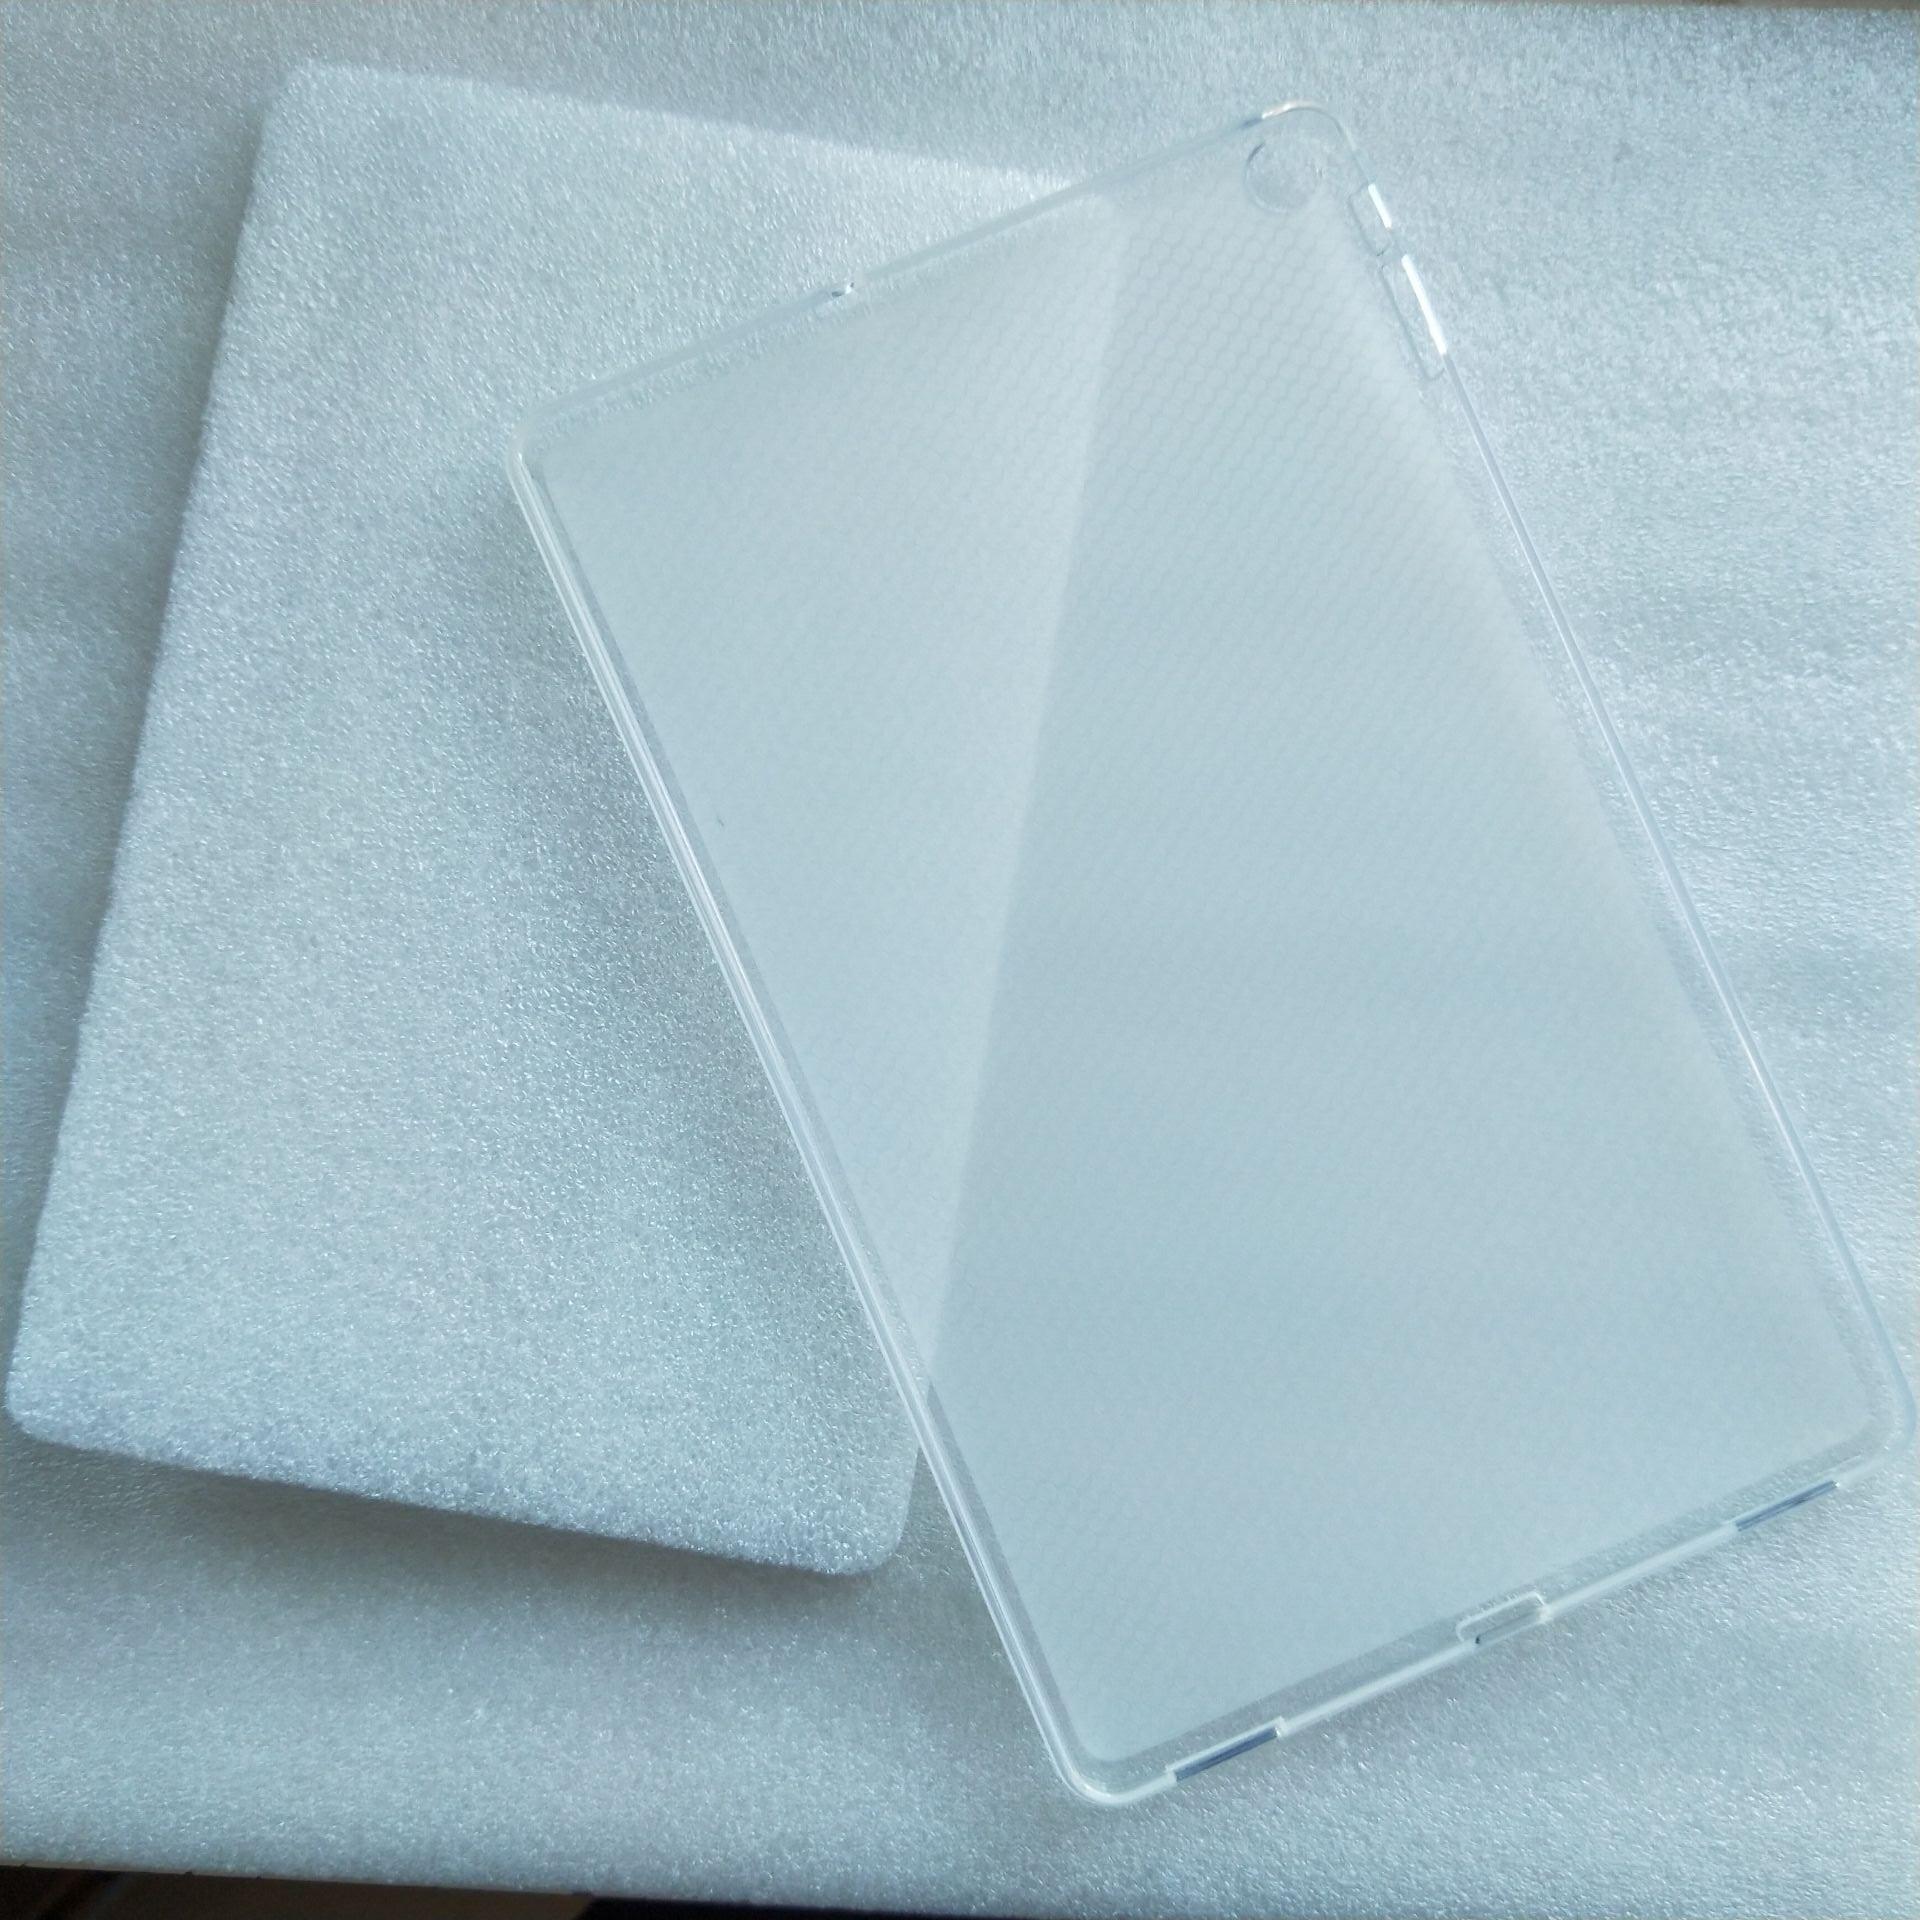 Protetora de Silicone para Alldocbe Protetora para Cube Iplay20 com 4 Capa Tablet 10.1 Presentes Iplay20 Pro pc